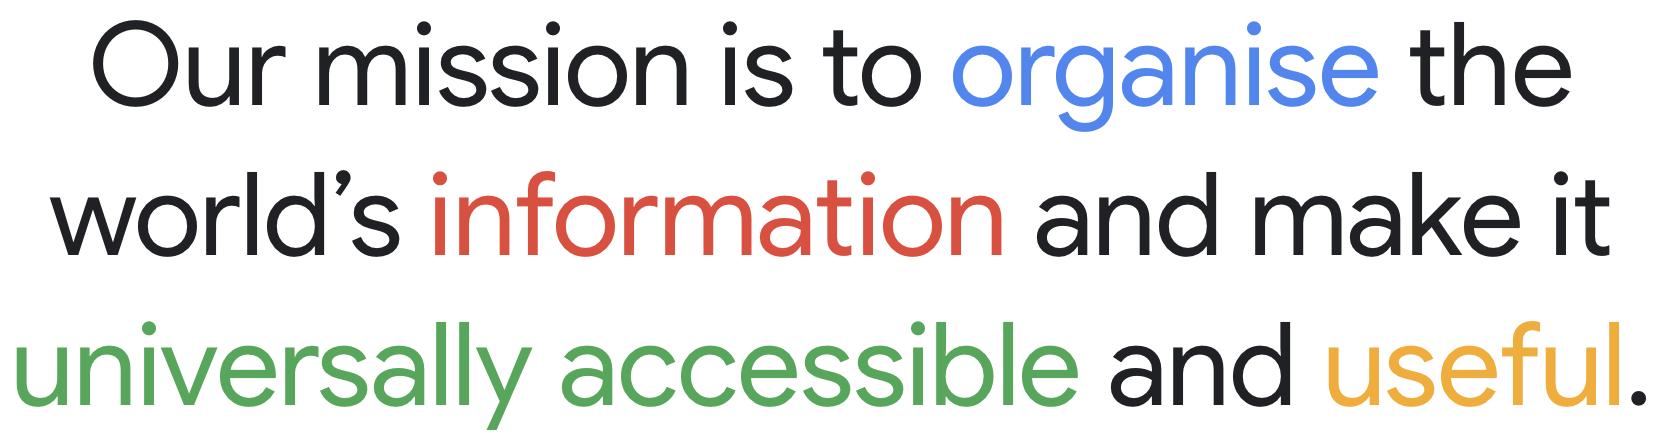 Google's brand mission